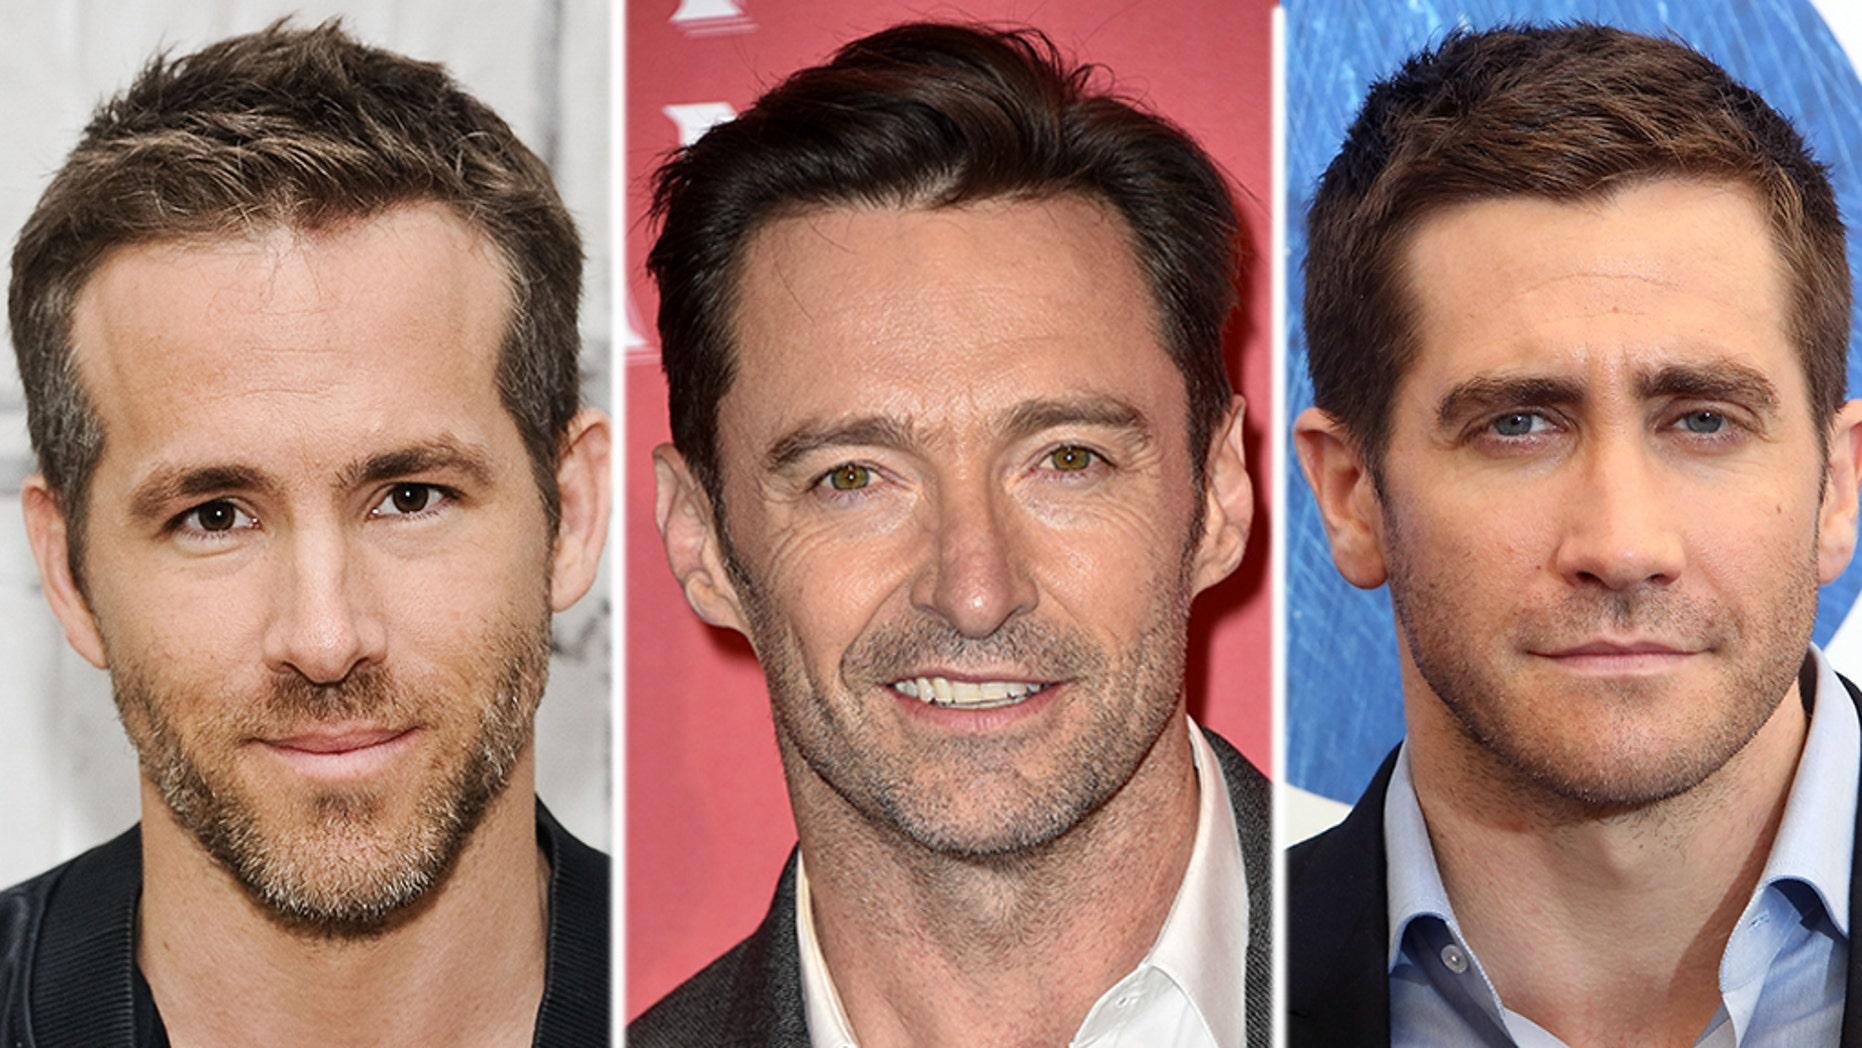 Ryan Reynolds Suffers Christmas Prank At Hands Of Hugh Jackman, Jake Gyllenhaal